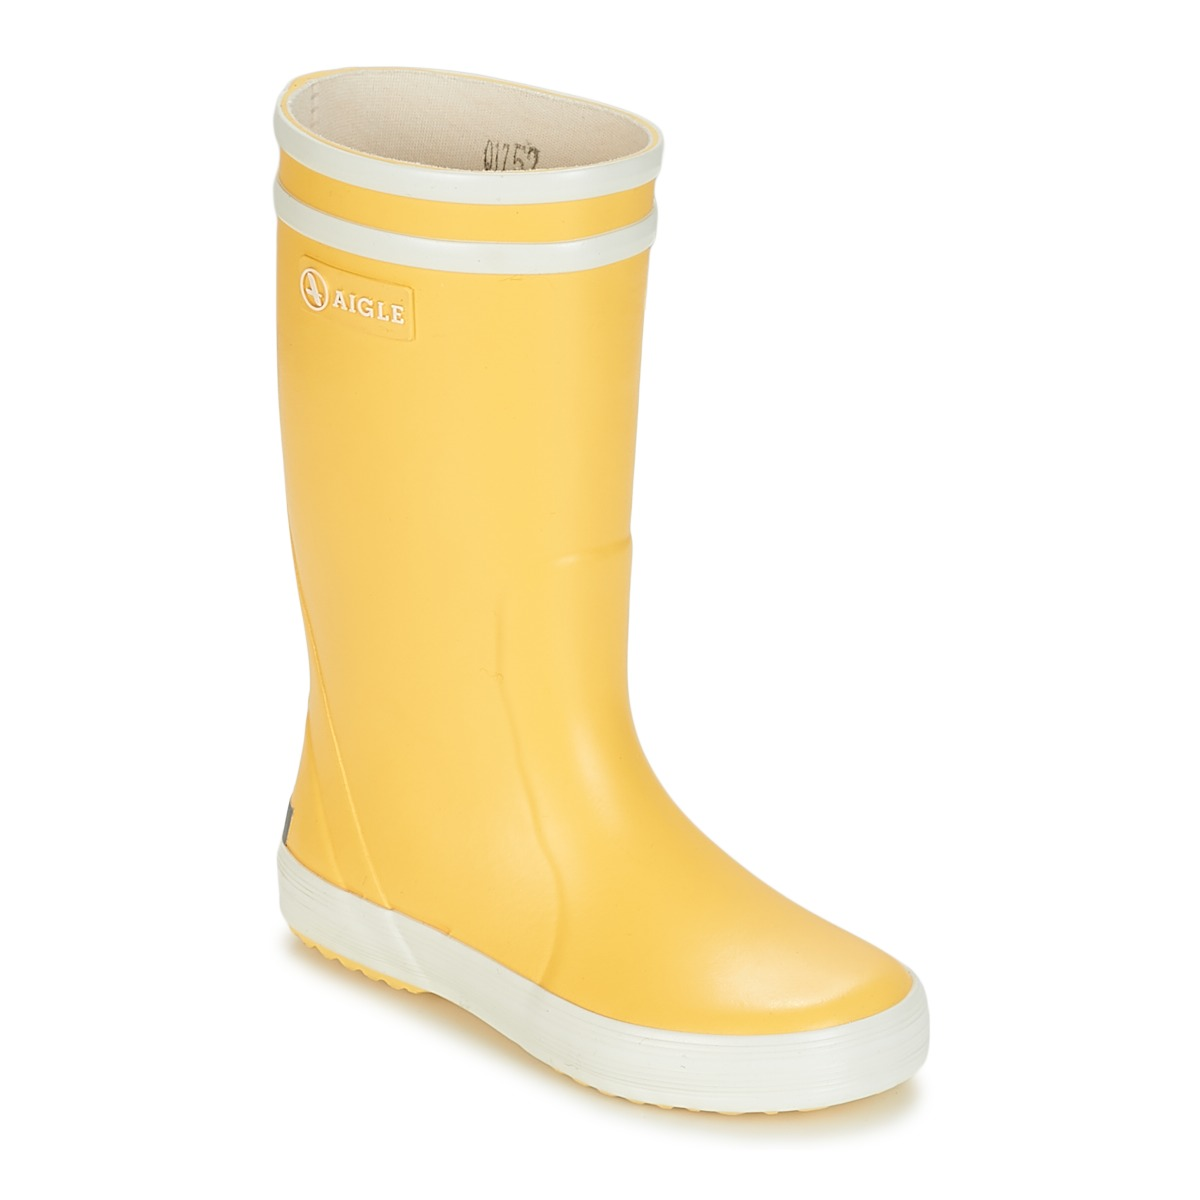 Aigle LOLLY POP Yellow / White